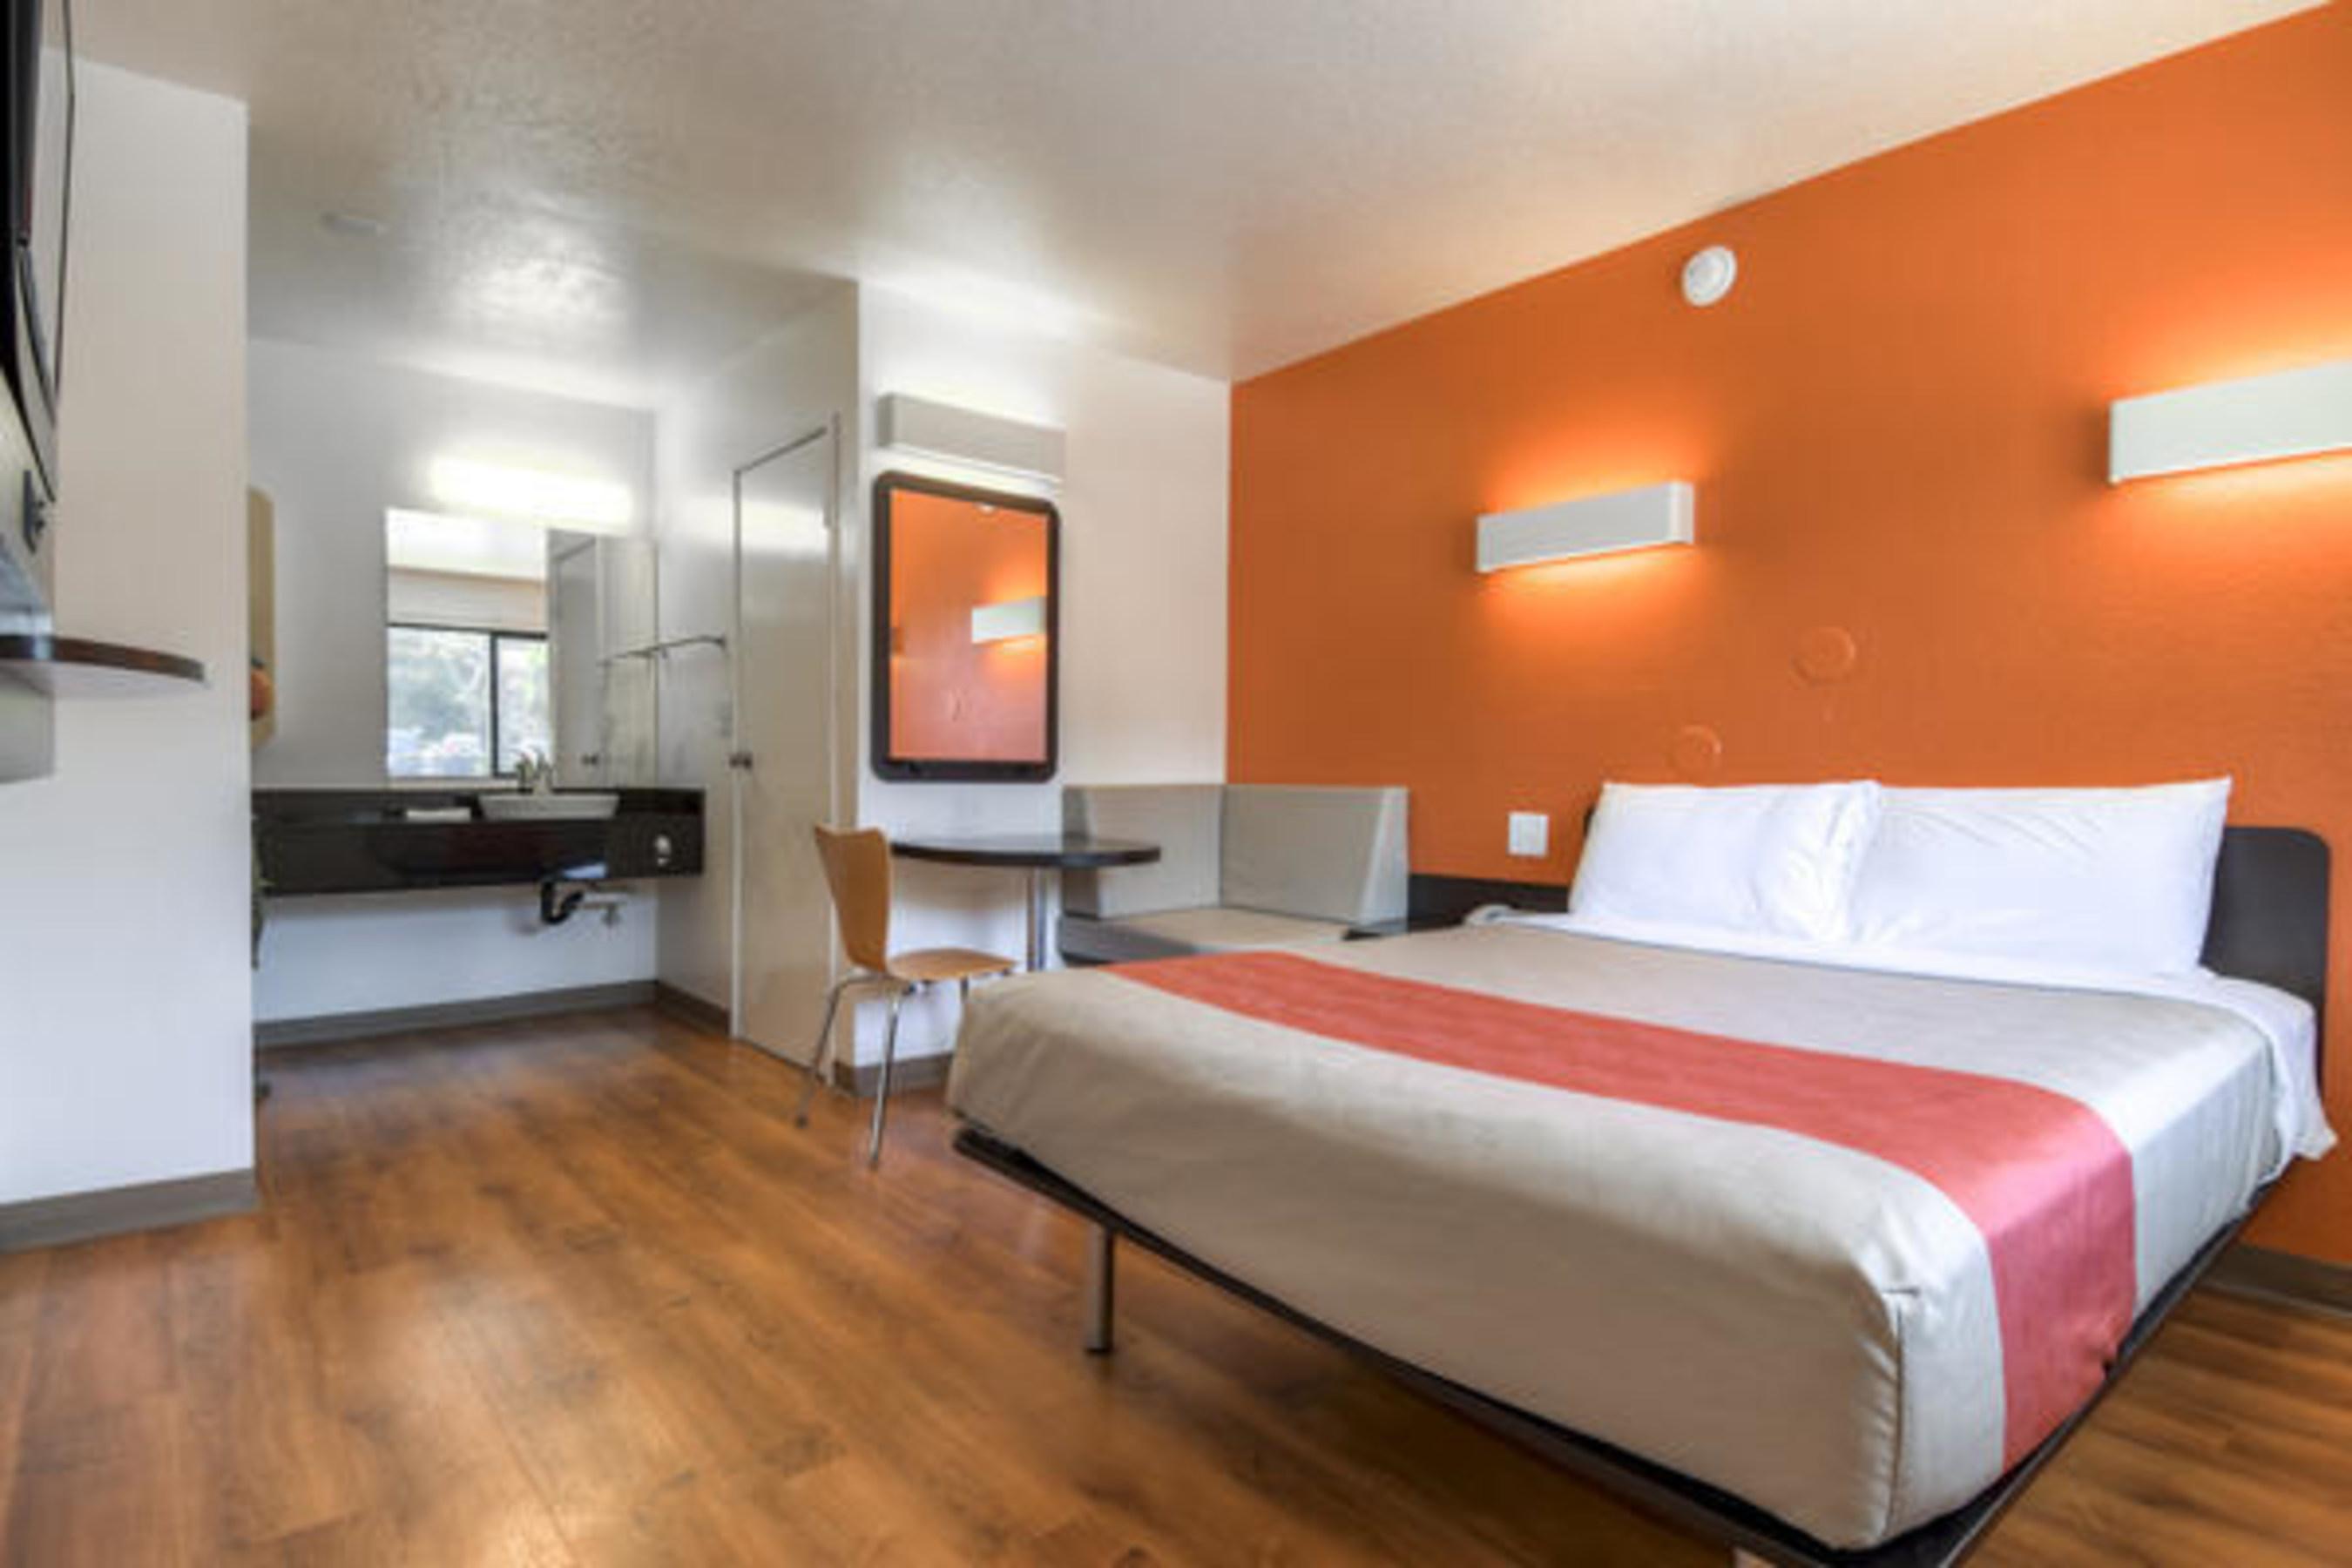 Motel 6 Phoenix Room Design Guest Room